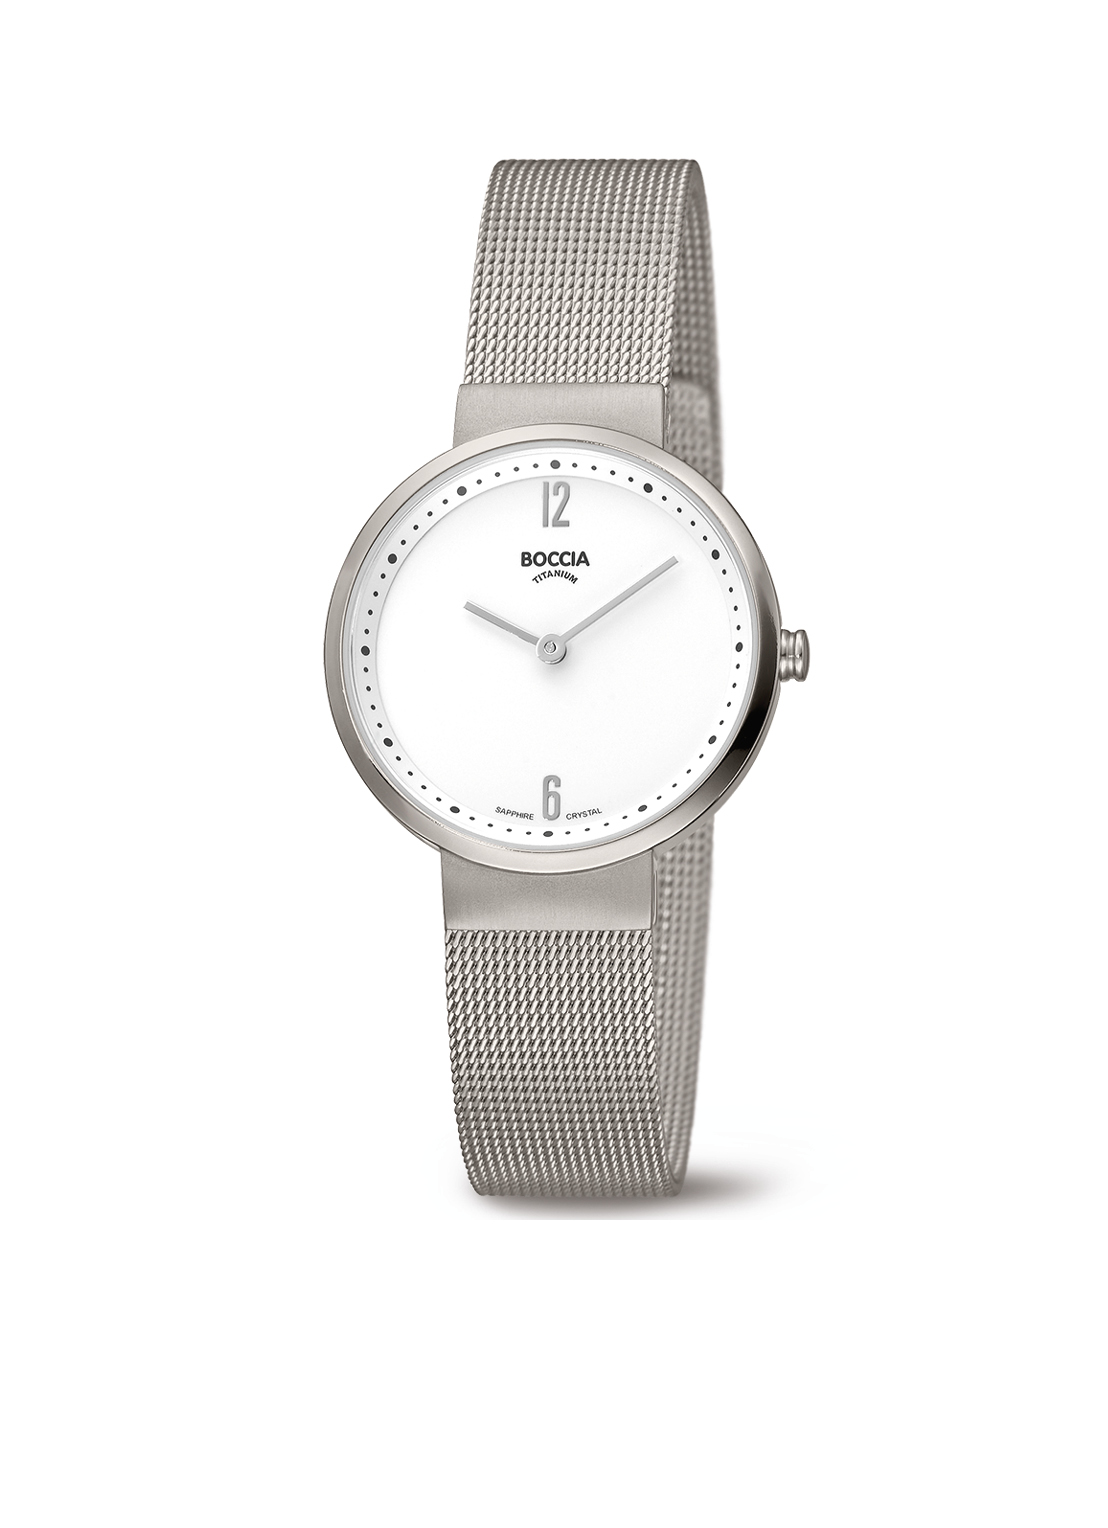 Boccia Titanium 3283.01 horloge Staal Zilverkleurig 30 mm